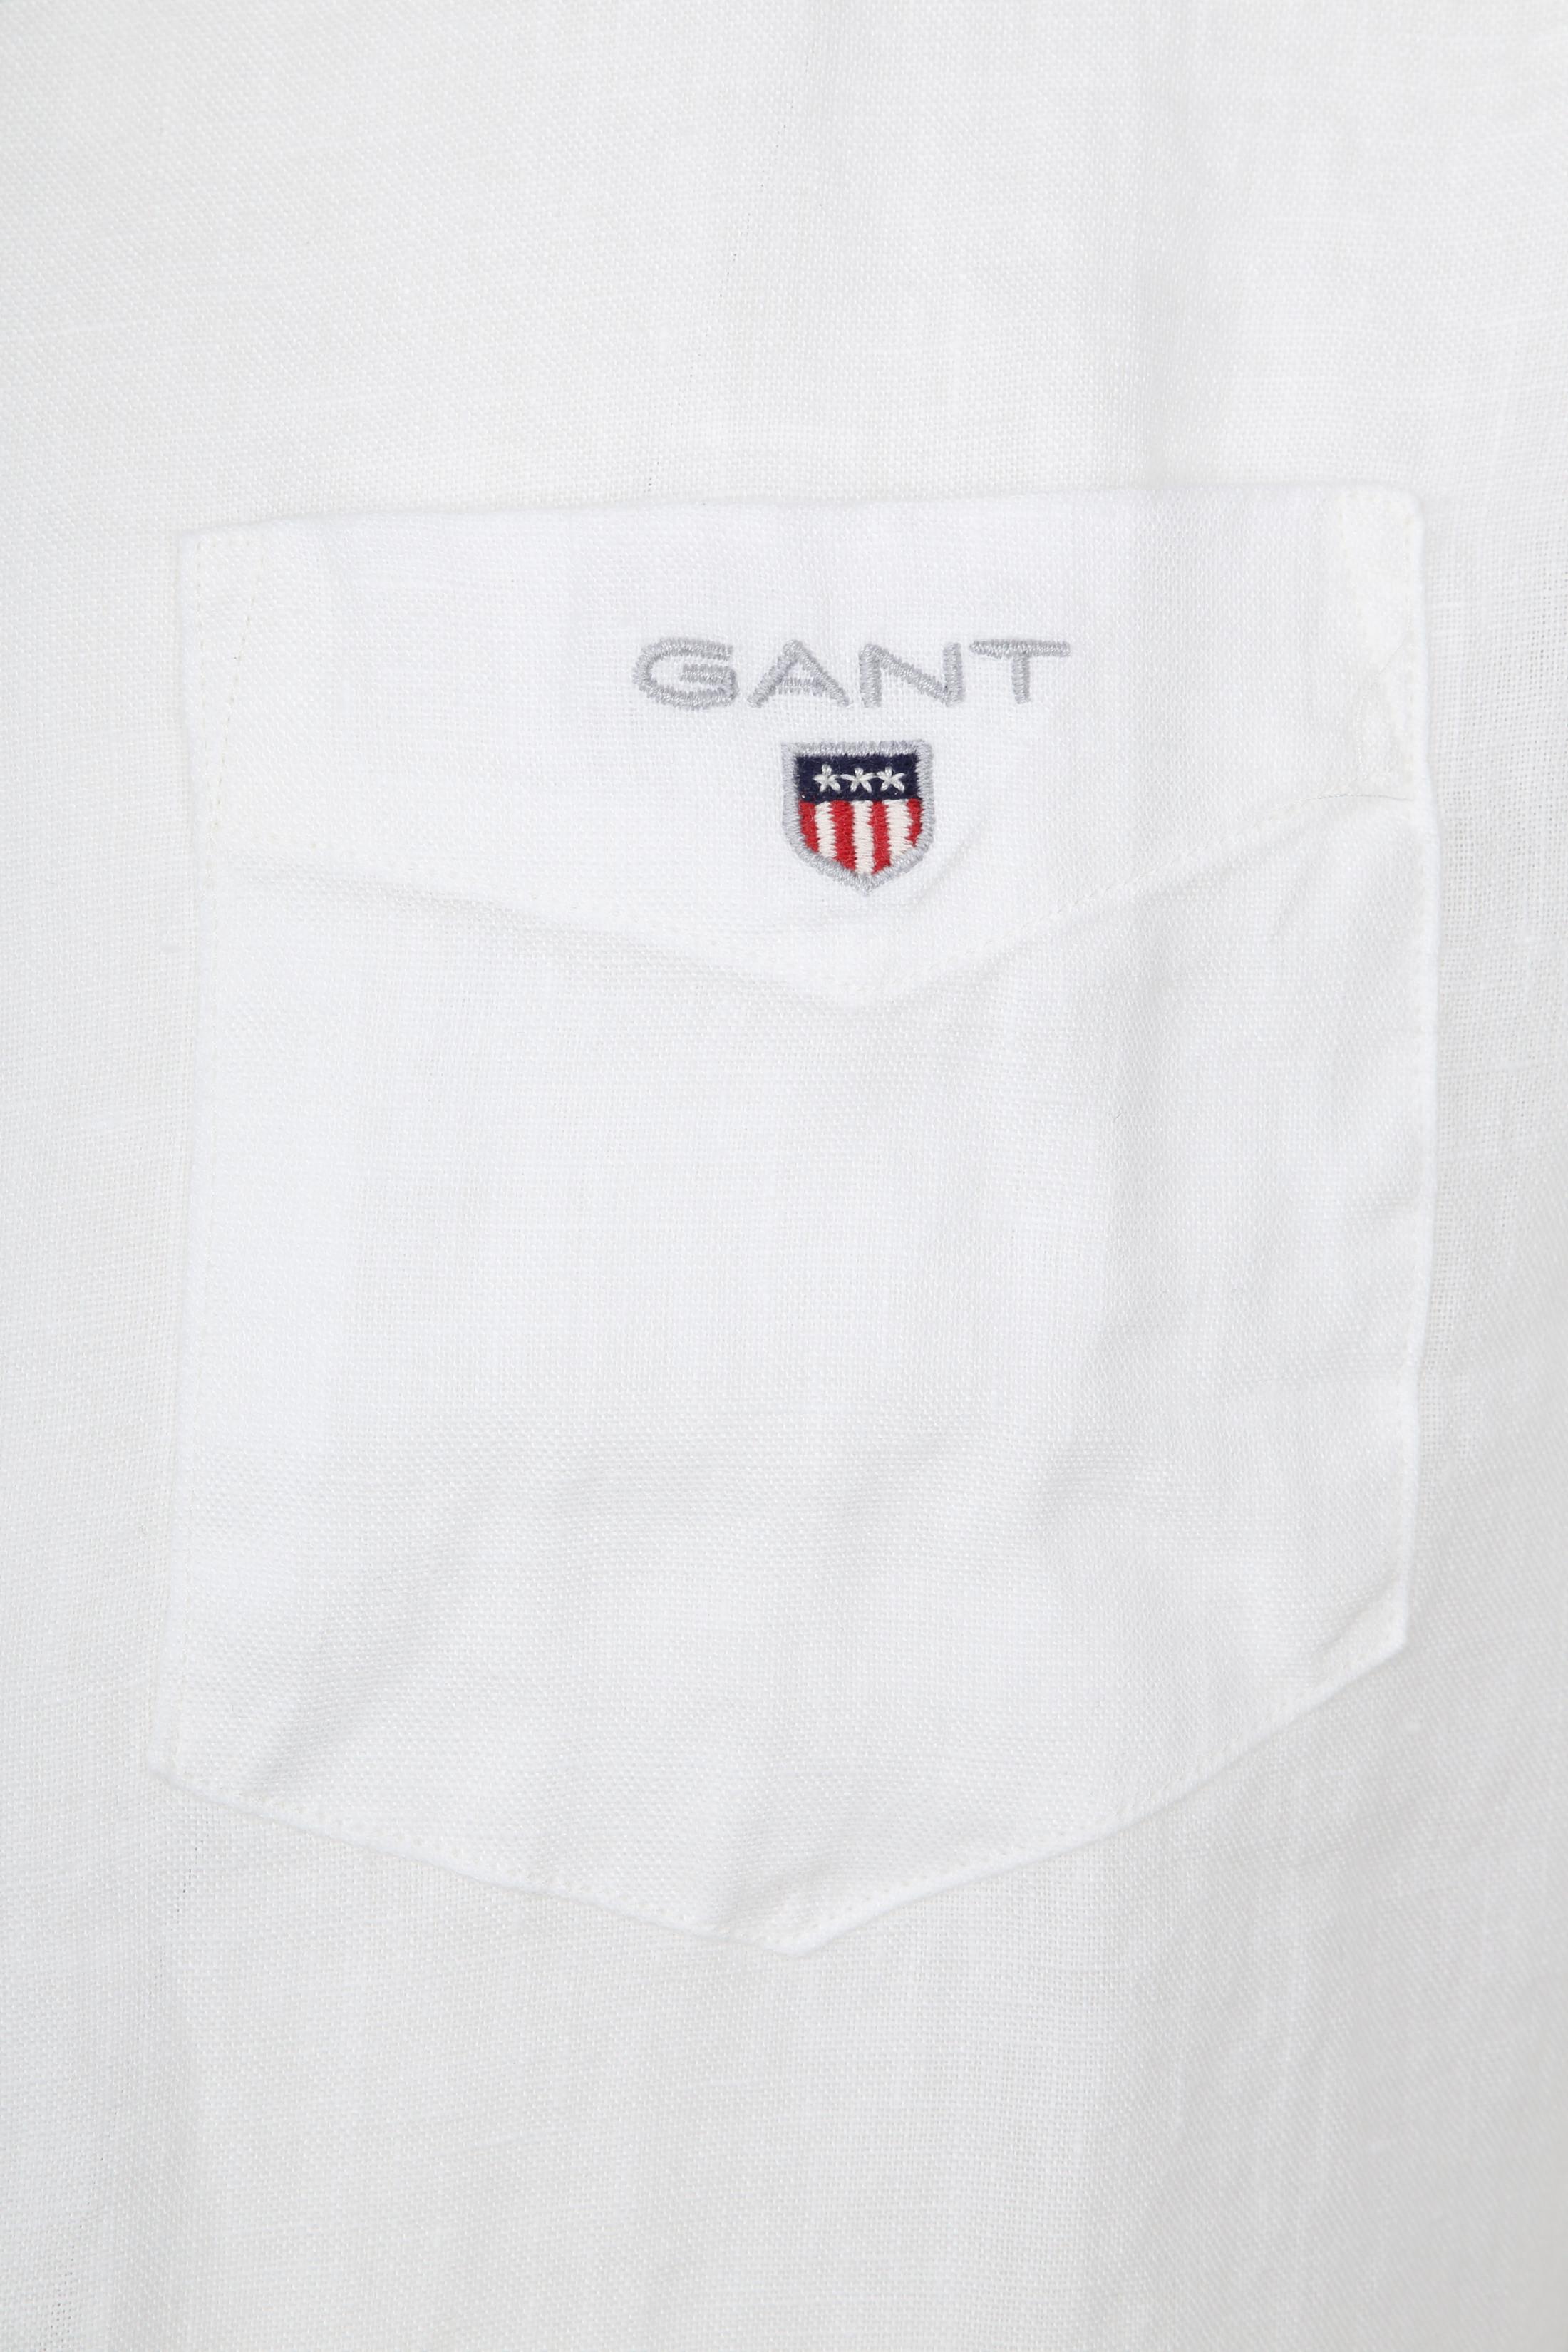 Gant Casual Overhemd Linnen Wit foto 1